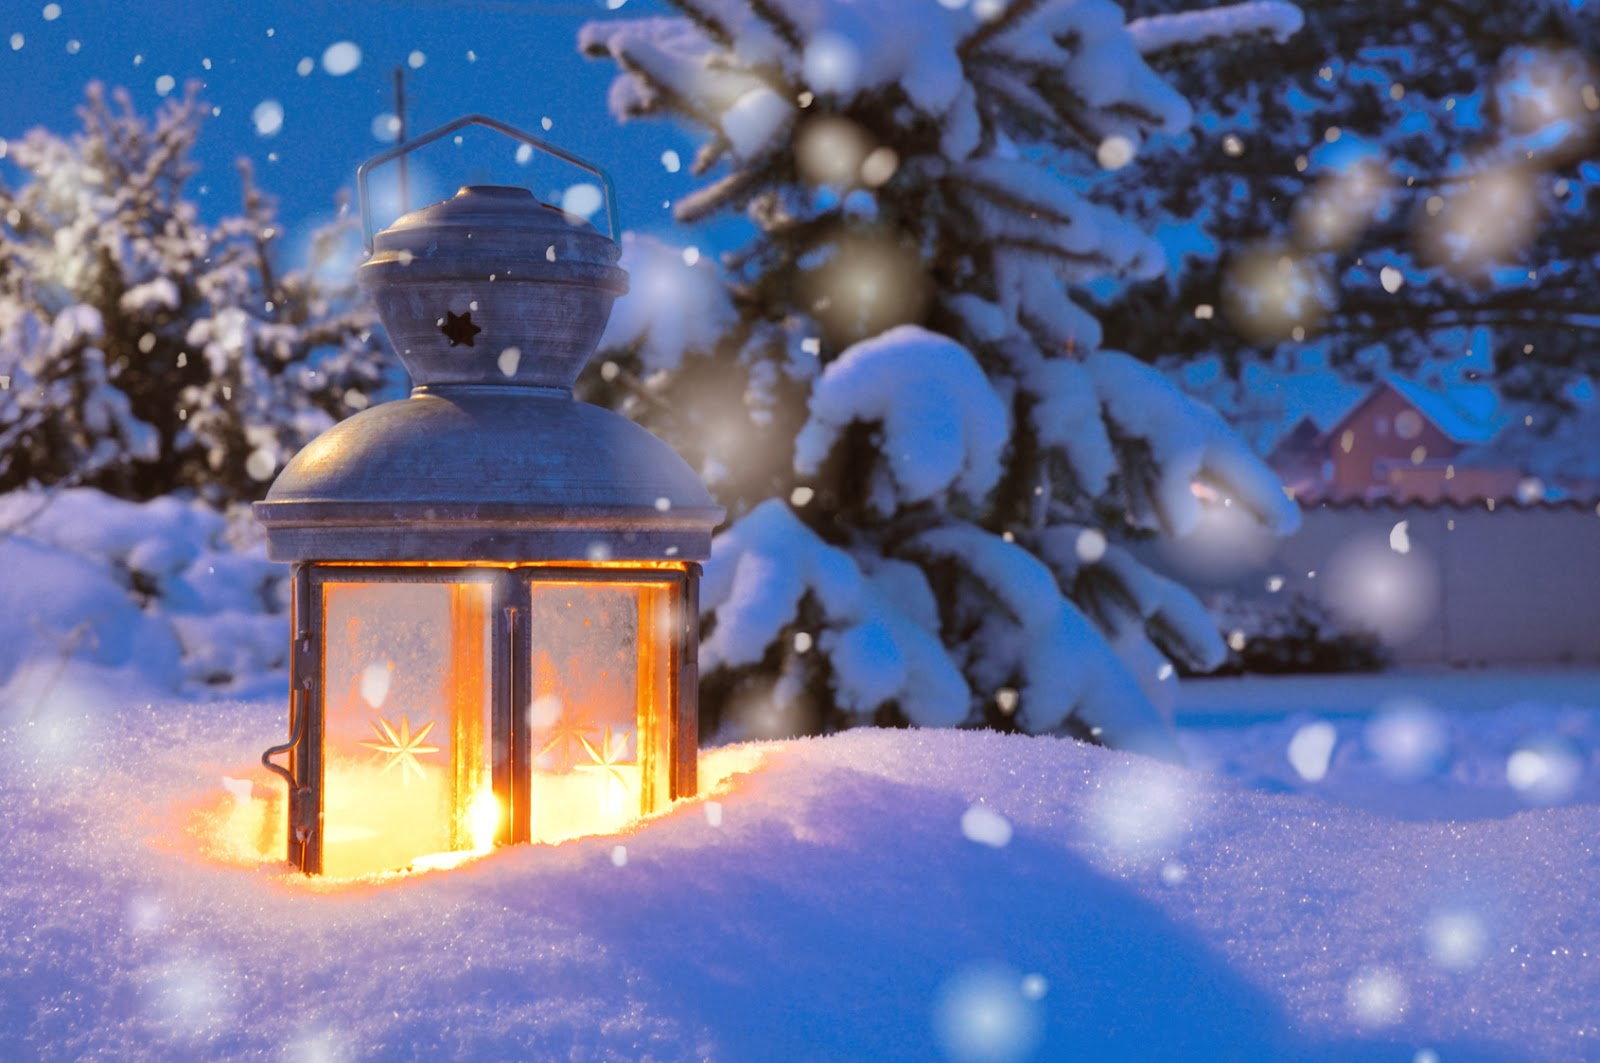 health care communication: Frohe Weihnachten!